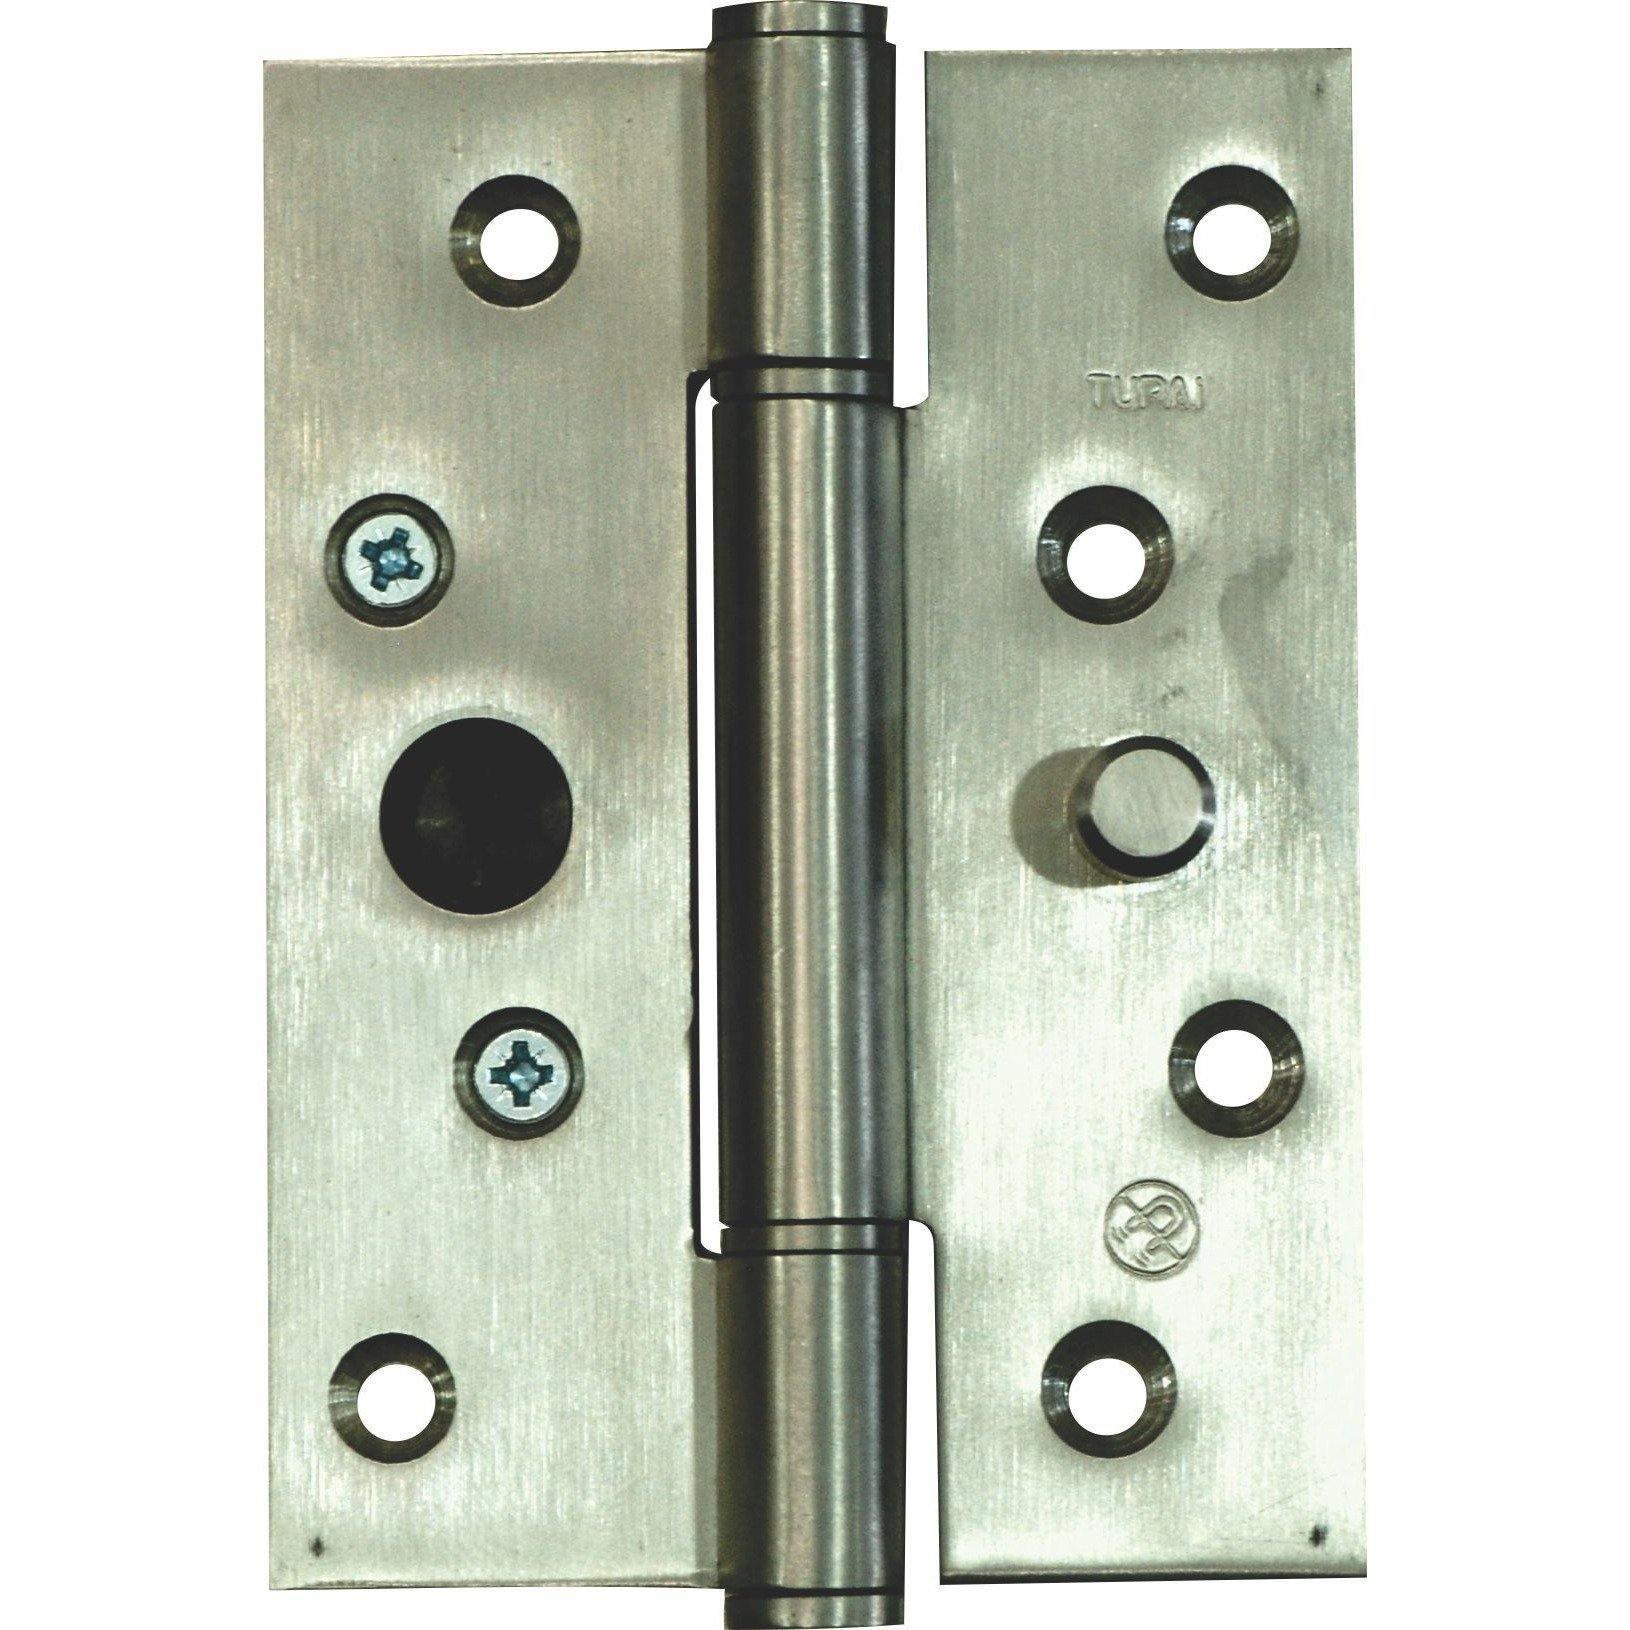 Heavy Duty Door Hinge - Stainless Steel - Anti-Lift